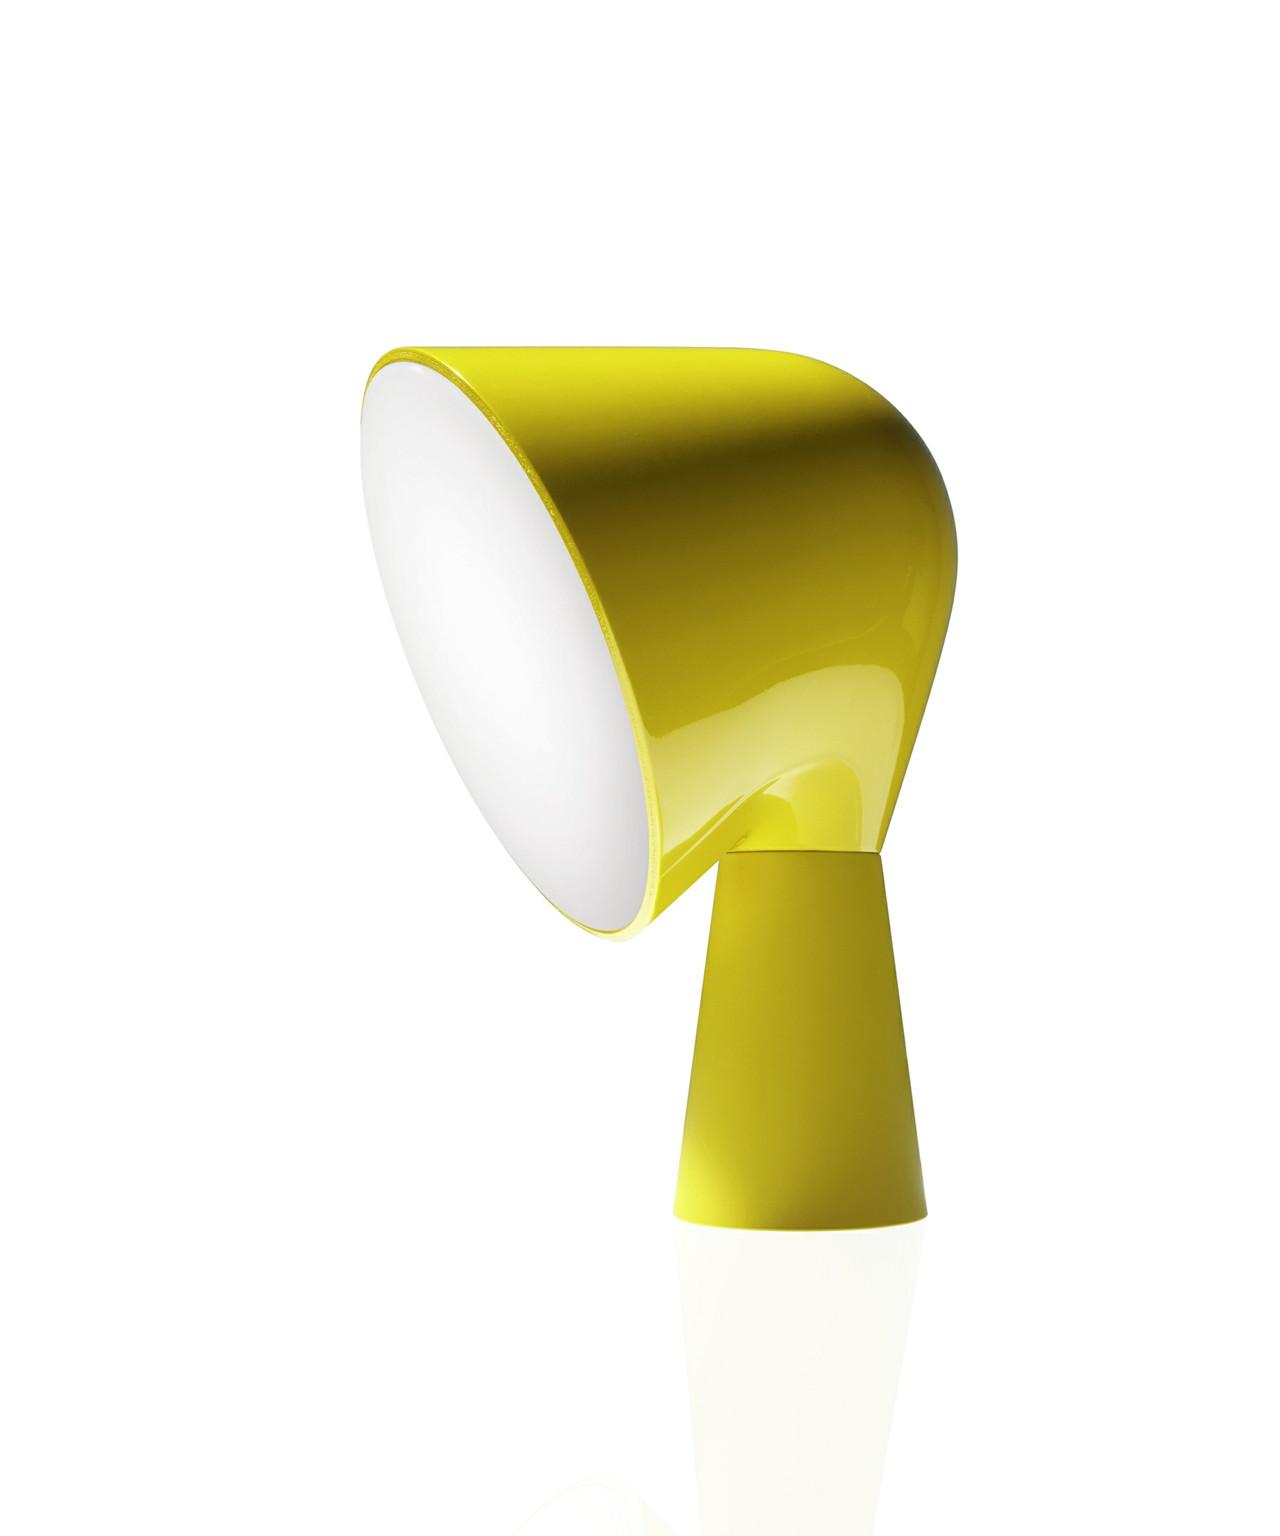 binic tischleuchte gelb foscarini. Black Bedroom Furniture Sets. Home Design Ideas